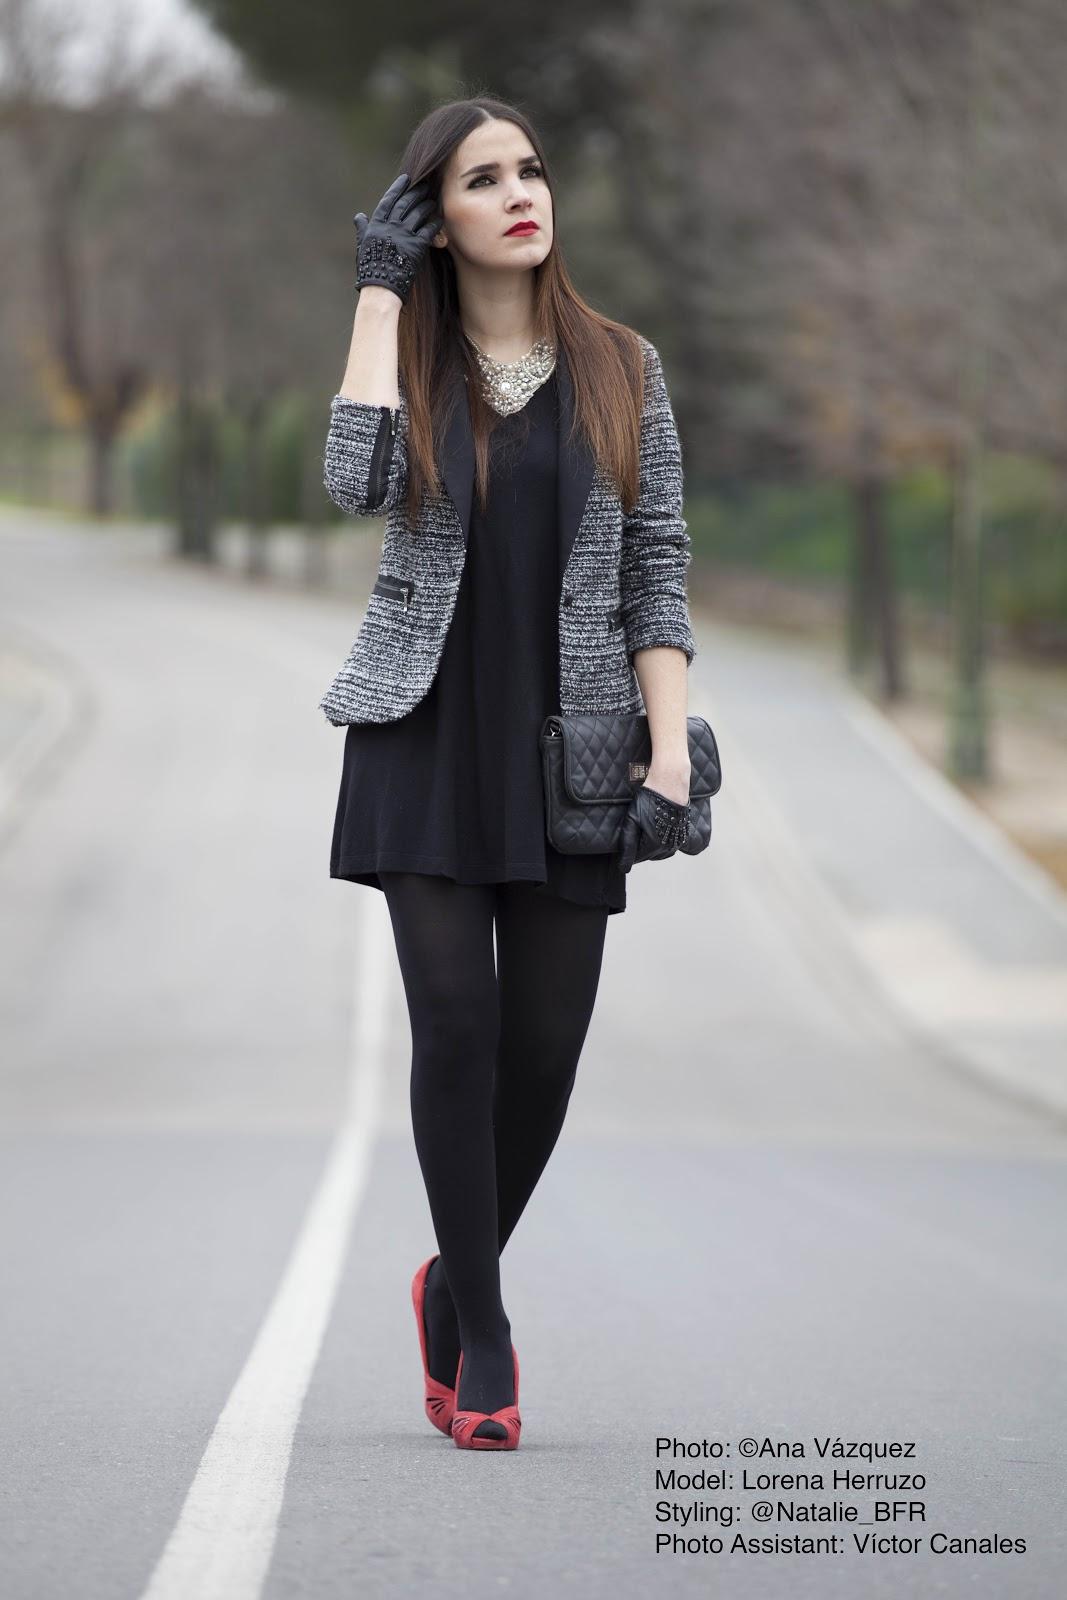 Glamour Goddess u00bfCu00f3mo combinar un vestido negro?